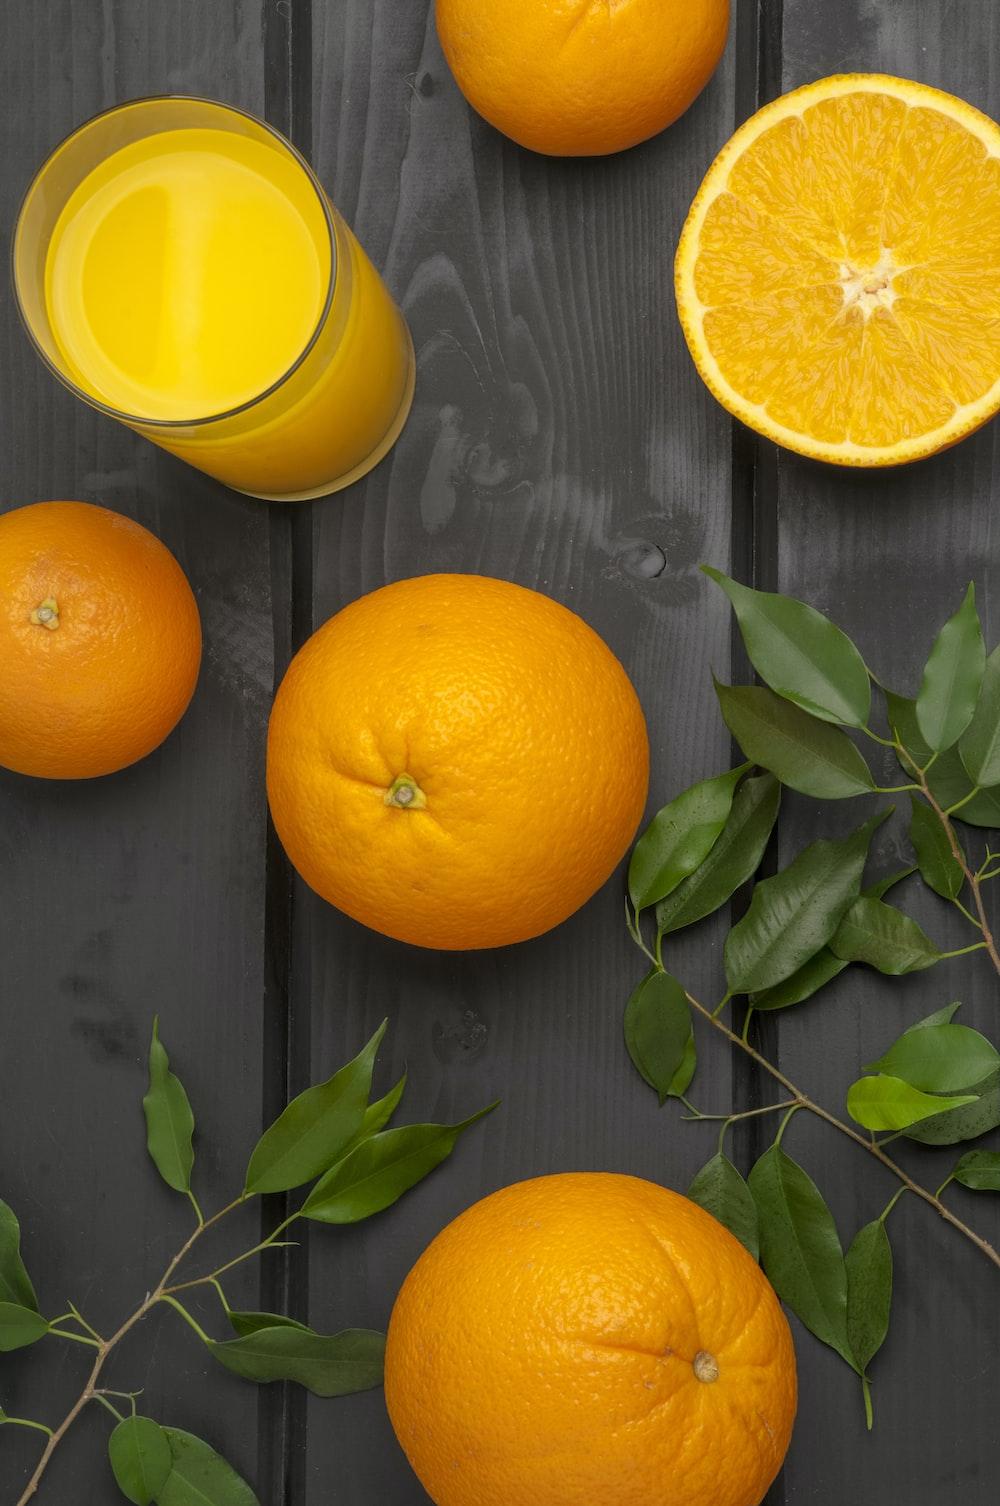 orange citrus fruits with juice